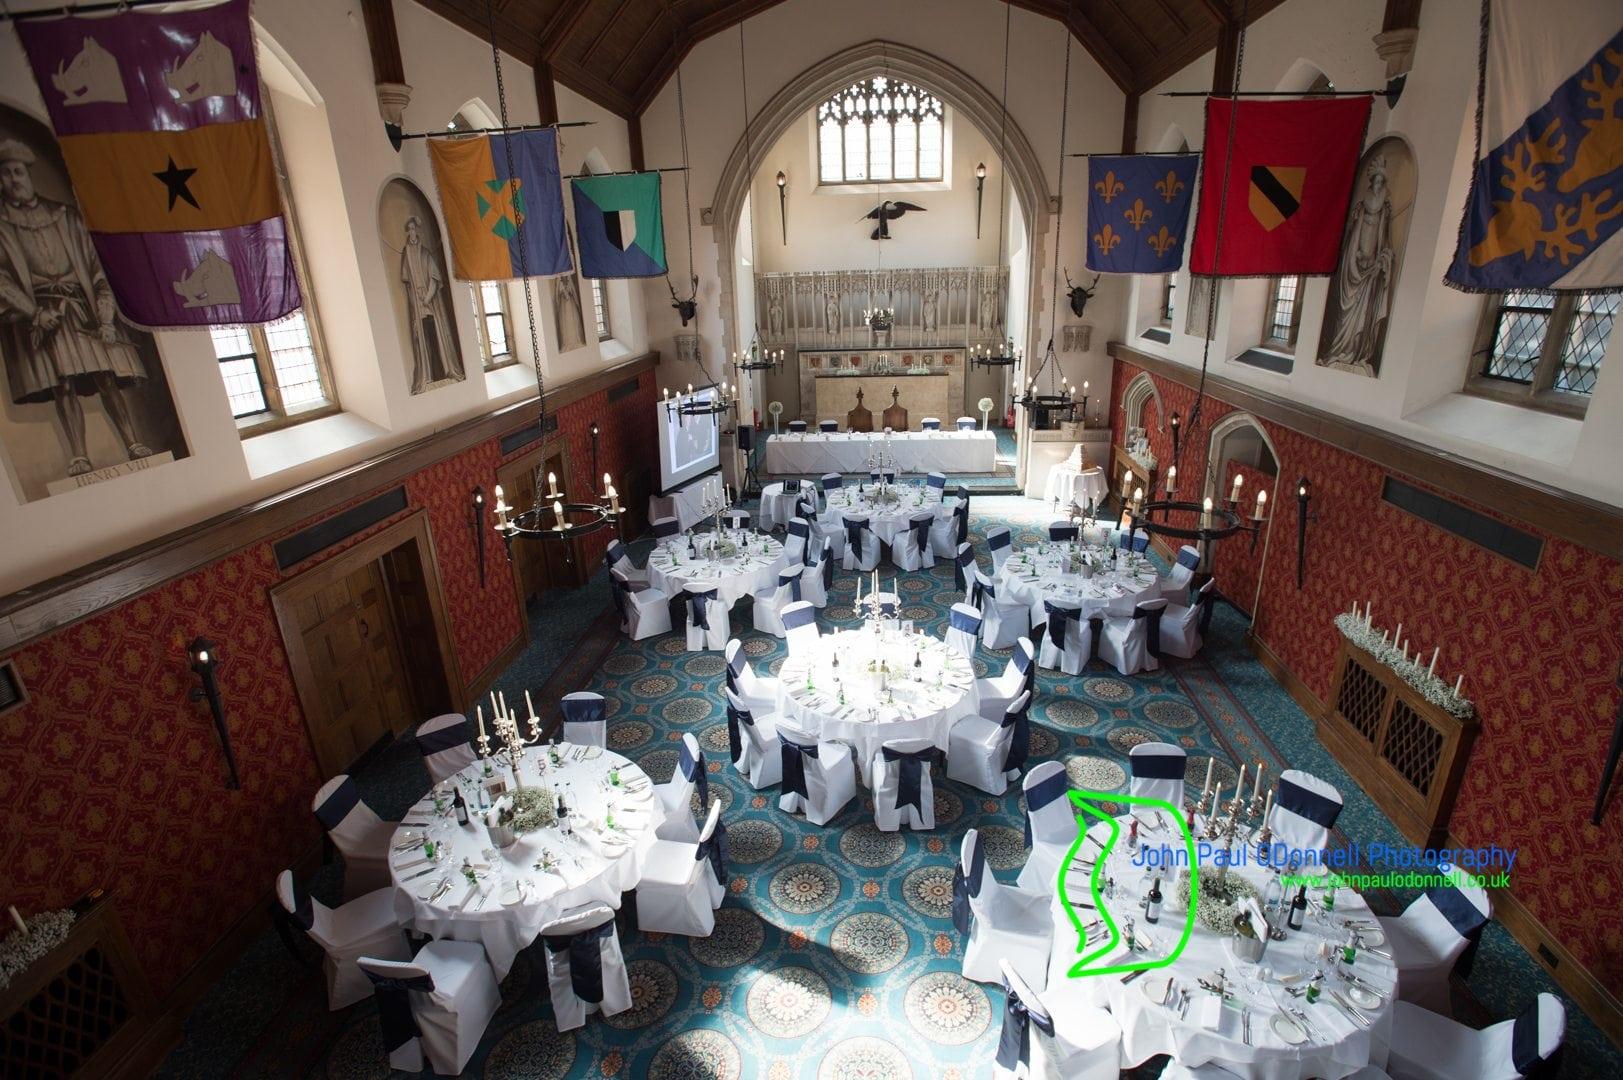 Hanbury Manor & Spa Wedding Venue Review - Hanbury Manor Wedding Photographer